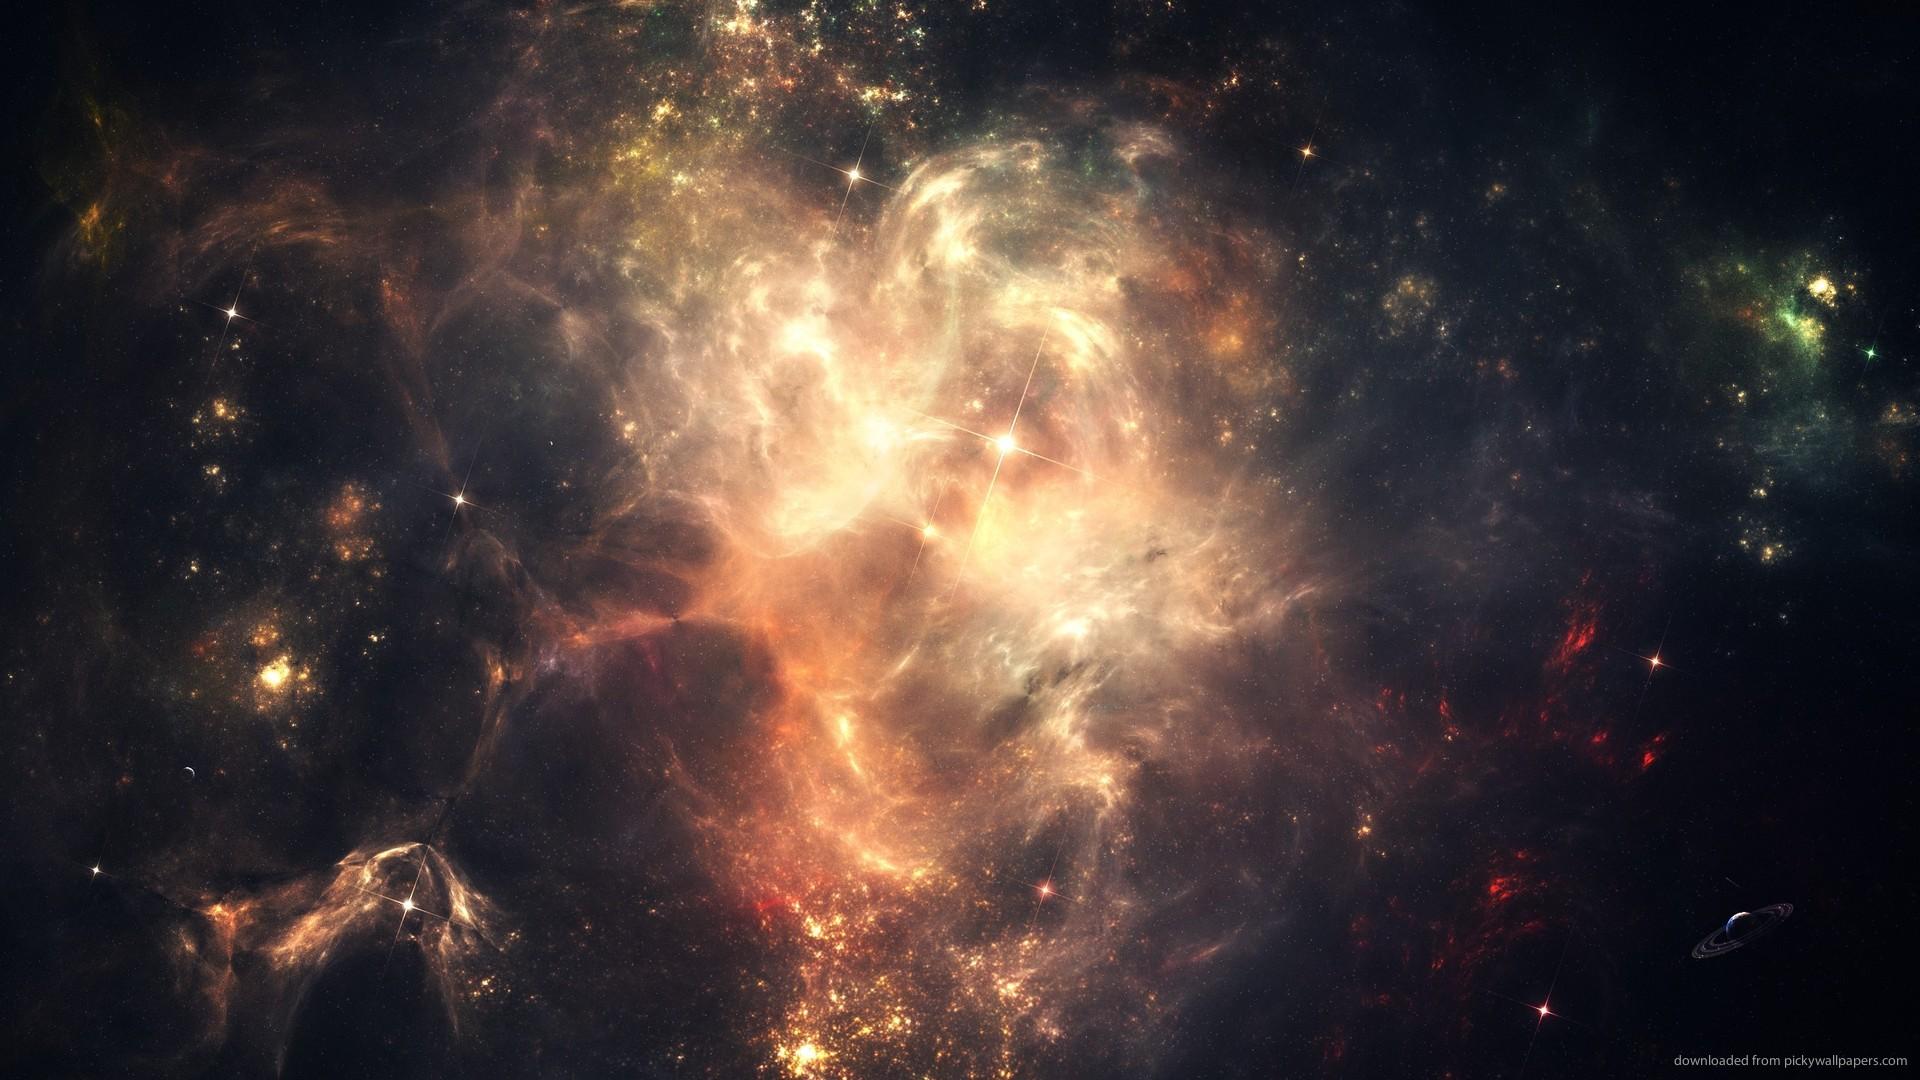 Galaxy Wallpaper 1080p - WallpaperSafari